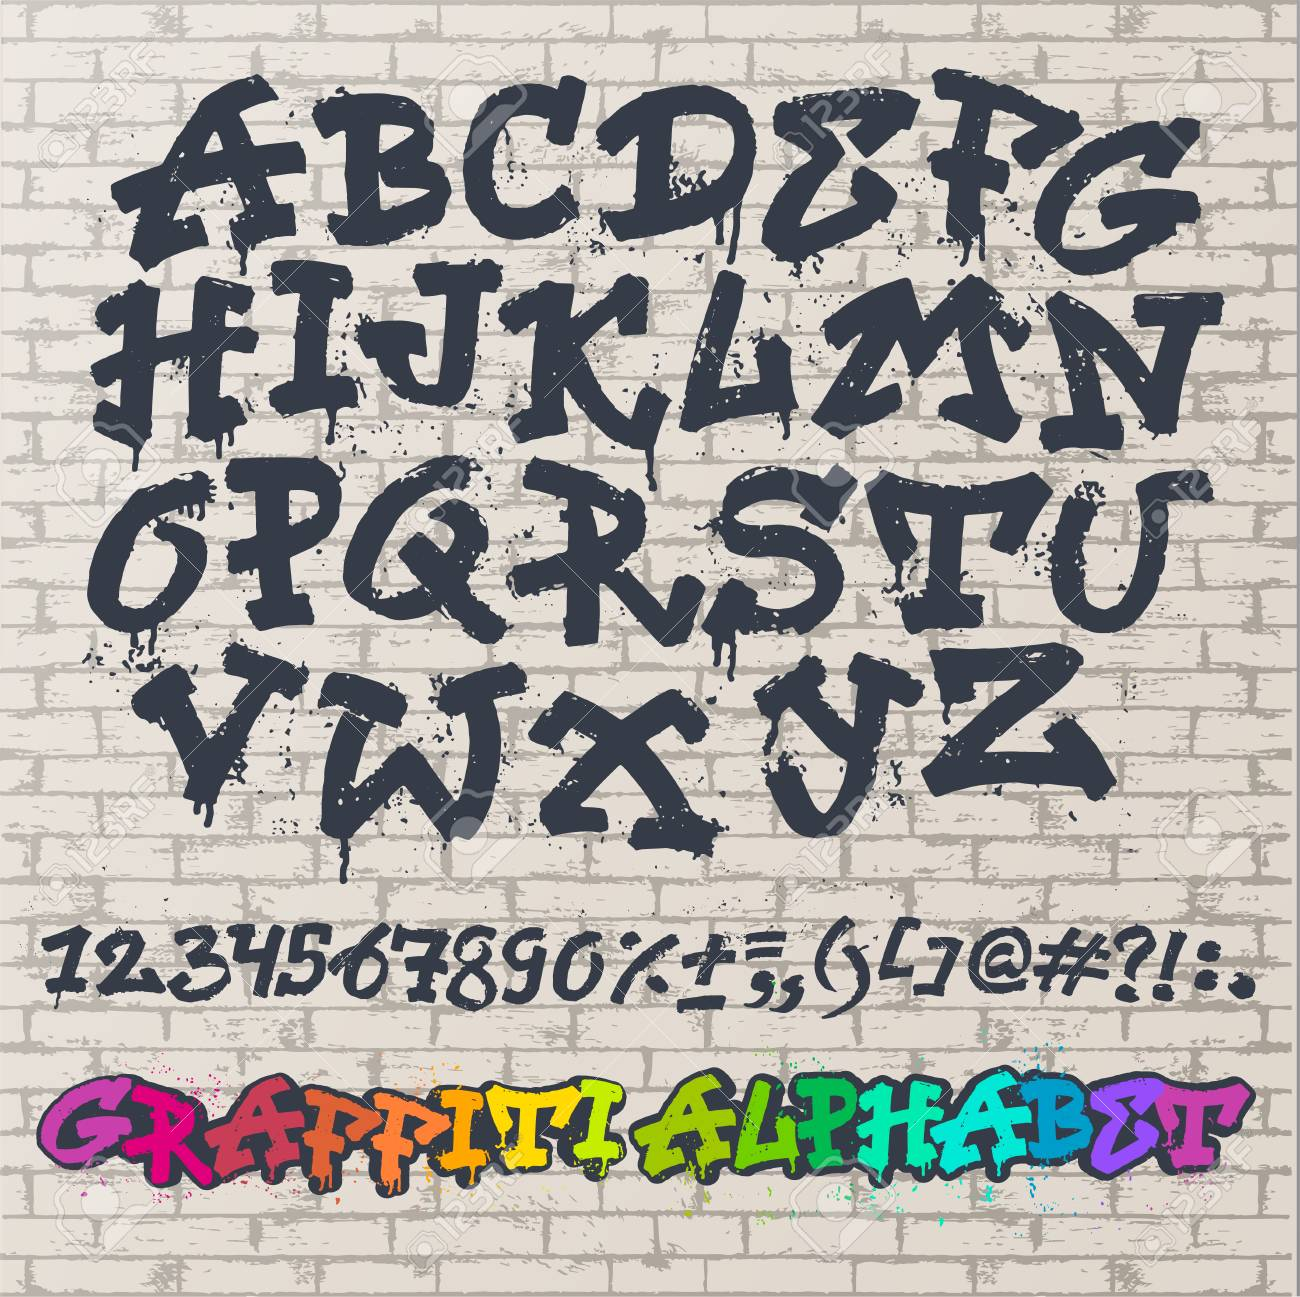 Alphabet graffiti font in brush stroke typography illustration isolated on brick wall background - 95279051